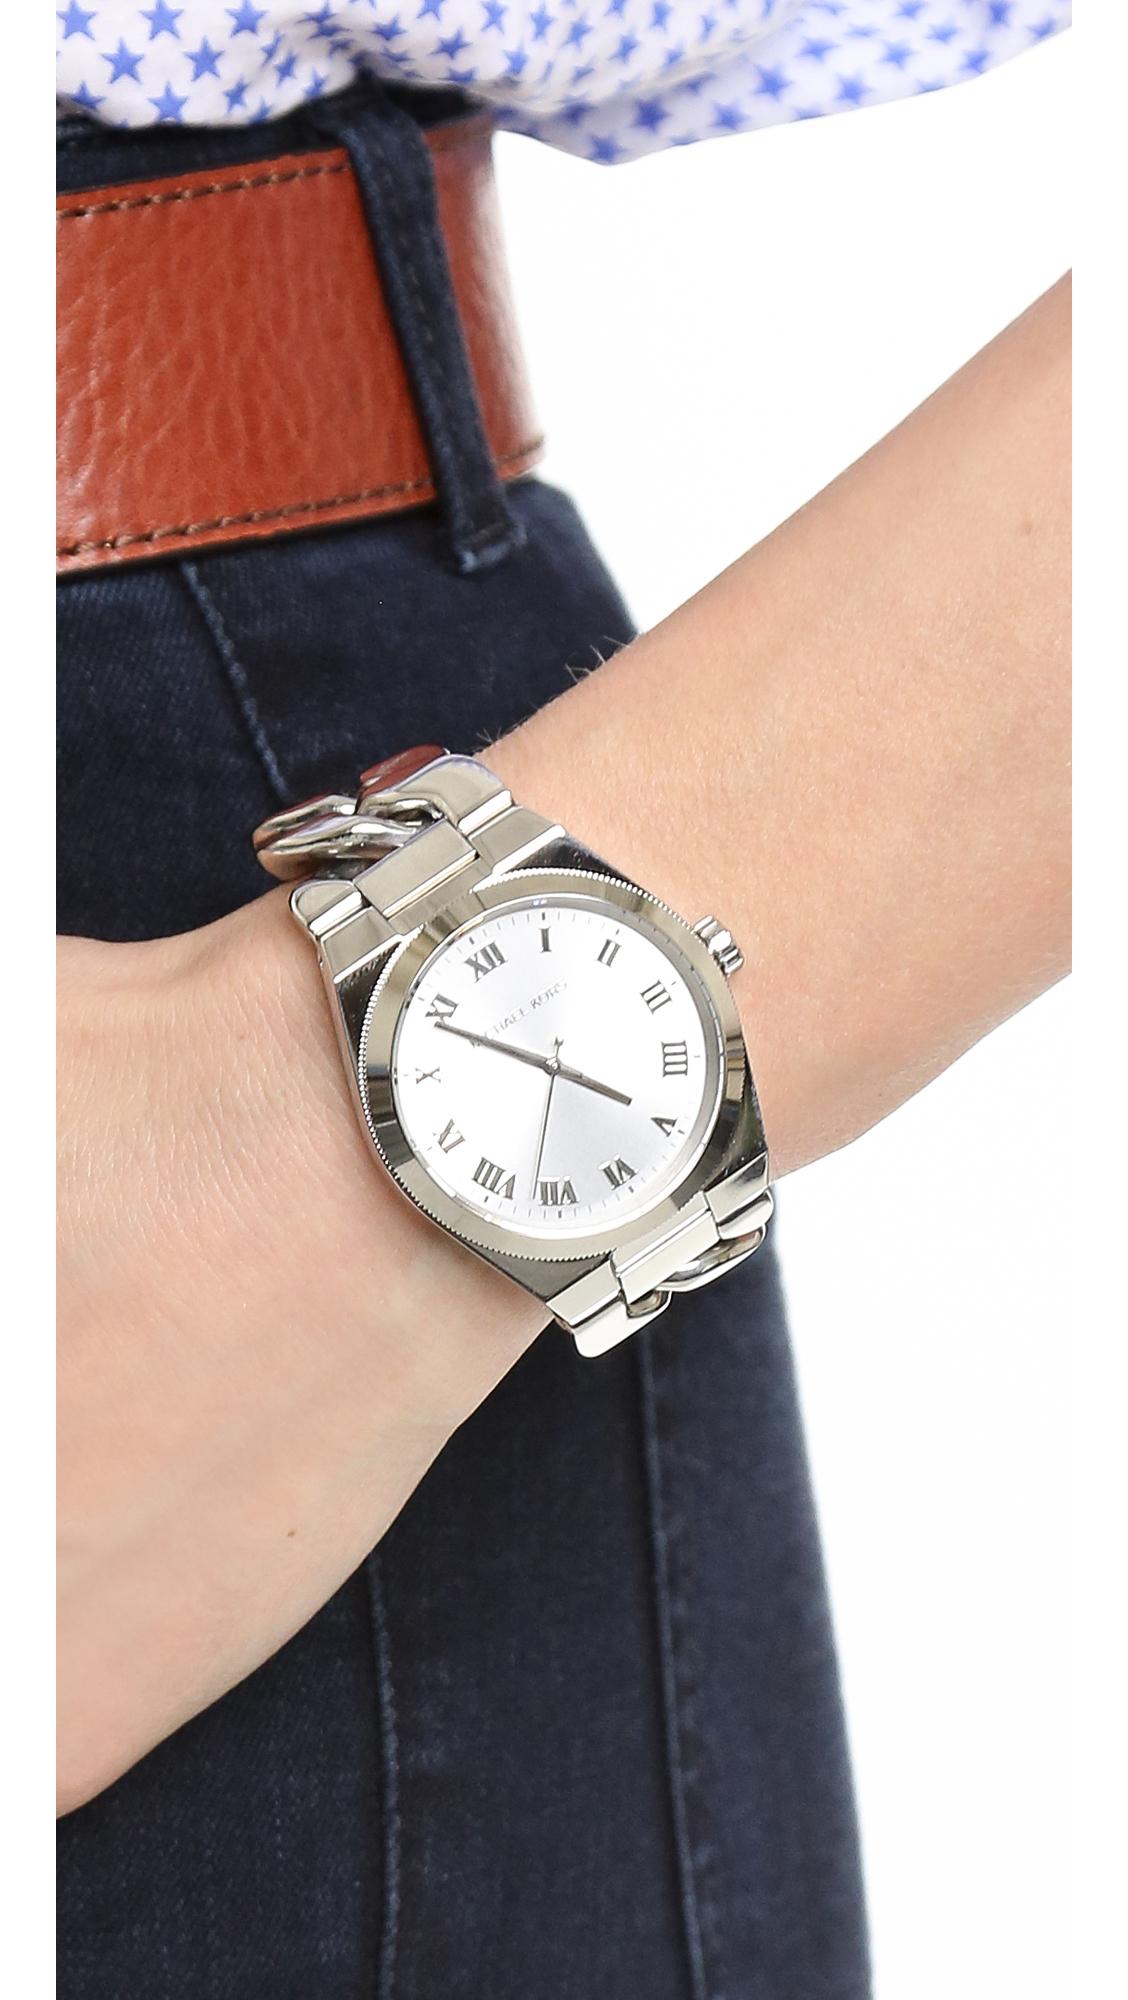 b7db525fba70 Michael Kors Channing Watch - Silver in Metallic - Lyst